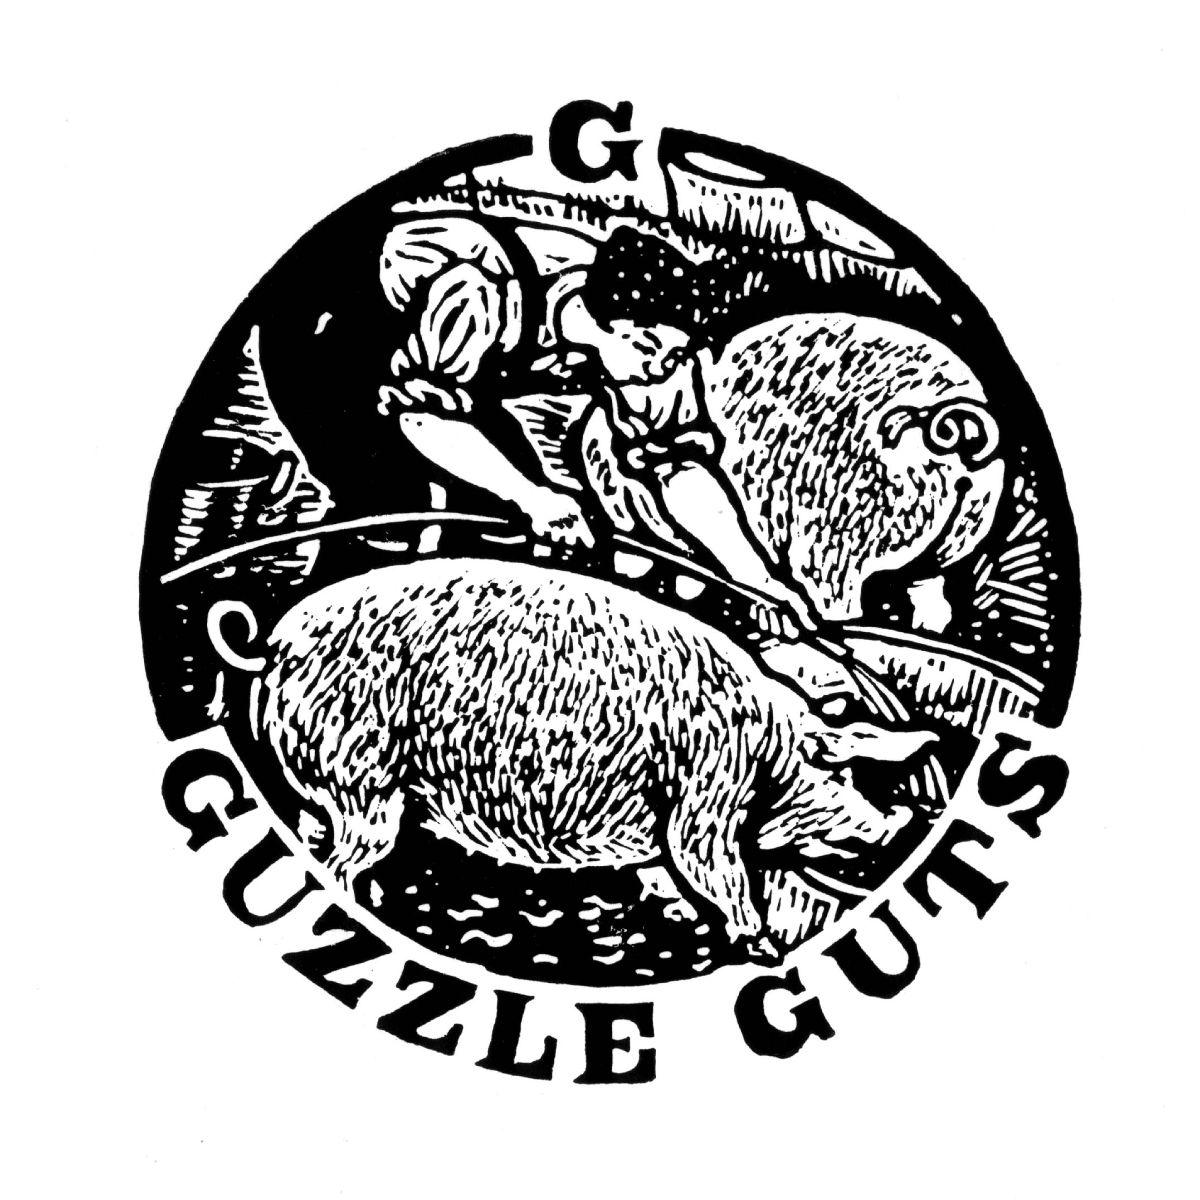 Guzzle guts